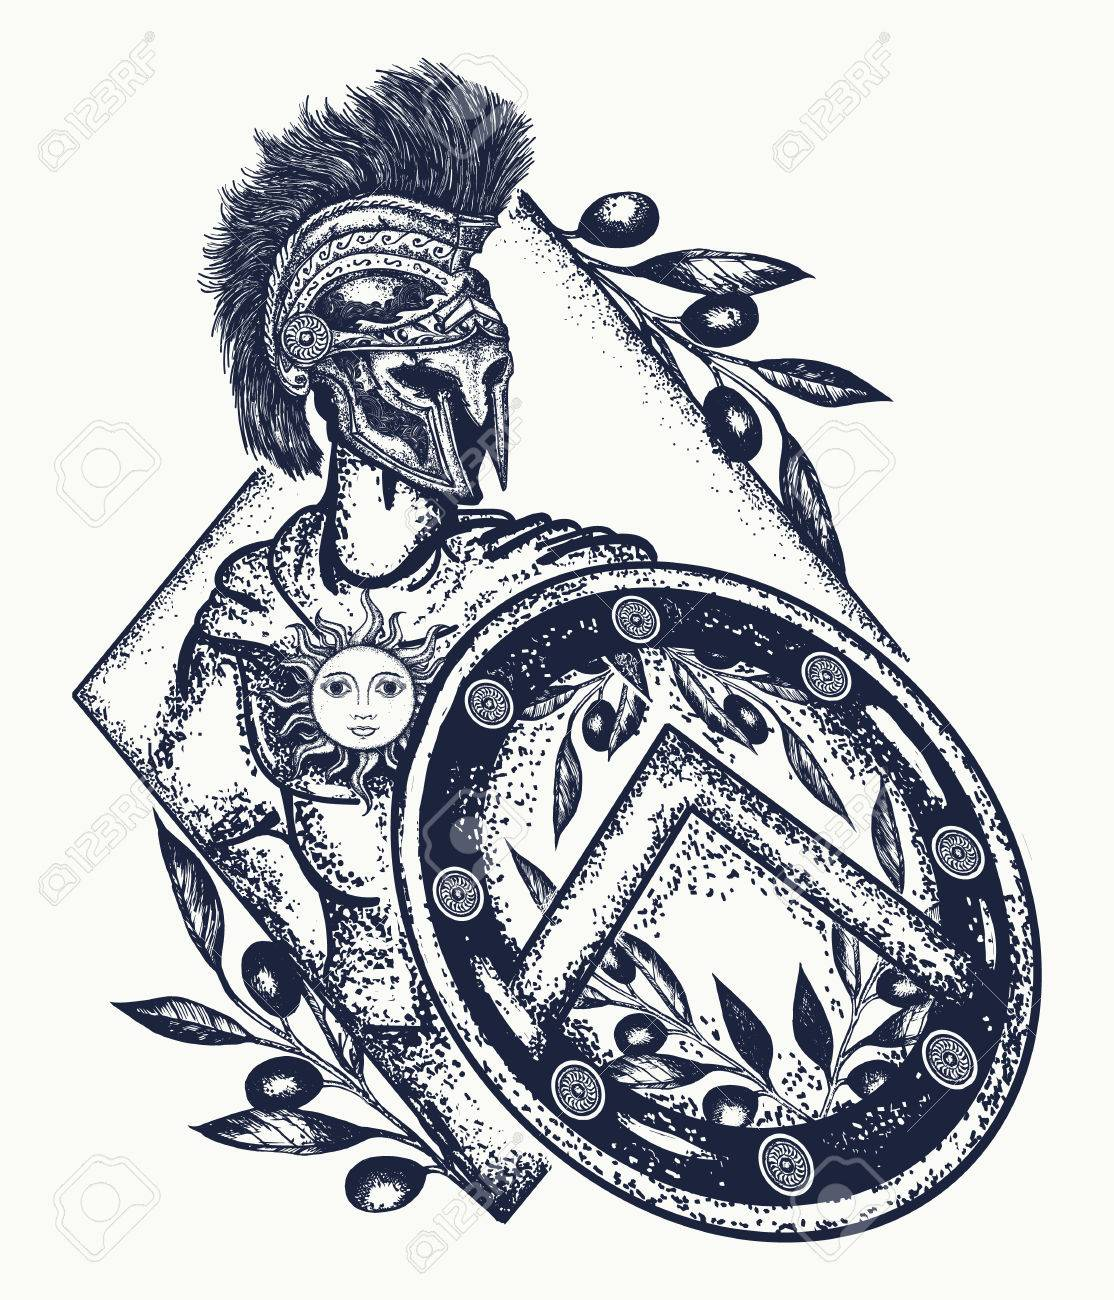 1114x1300 Spartan Warrior Tattoo Art. Legionary Of Ancient Rome And Ancient